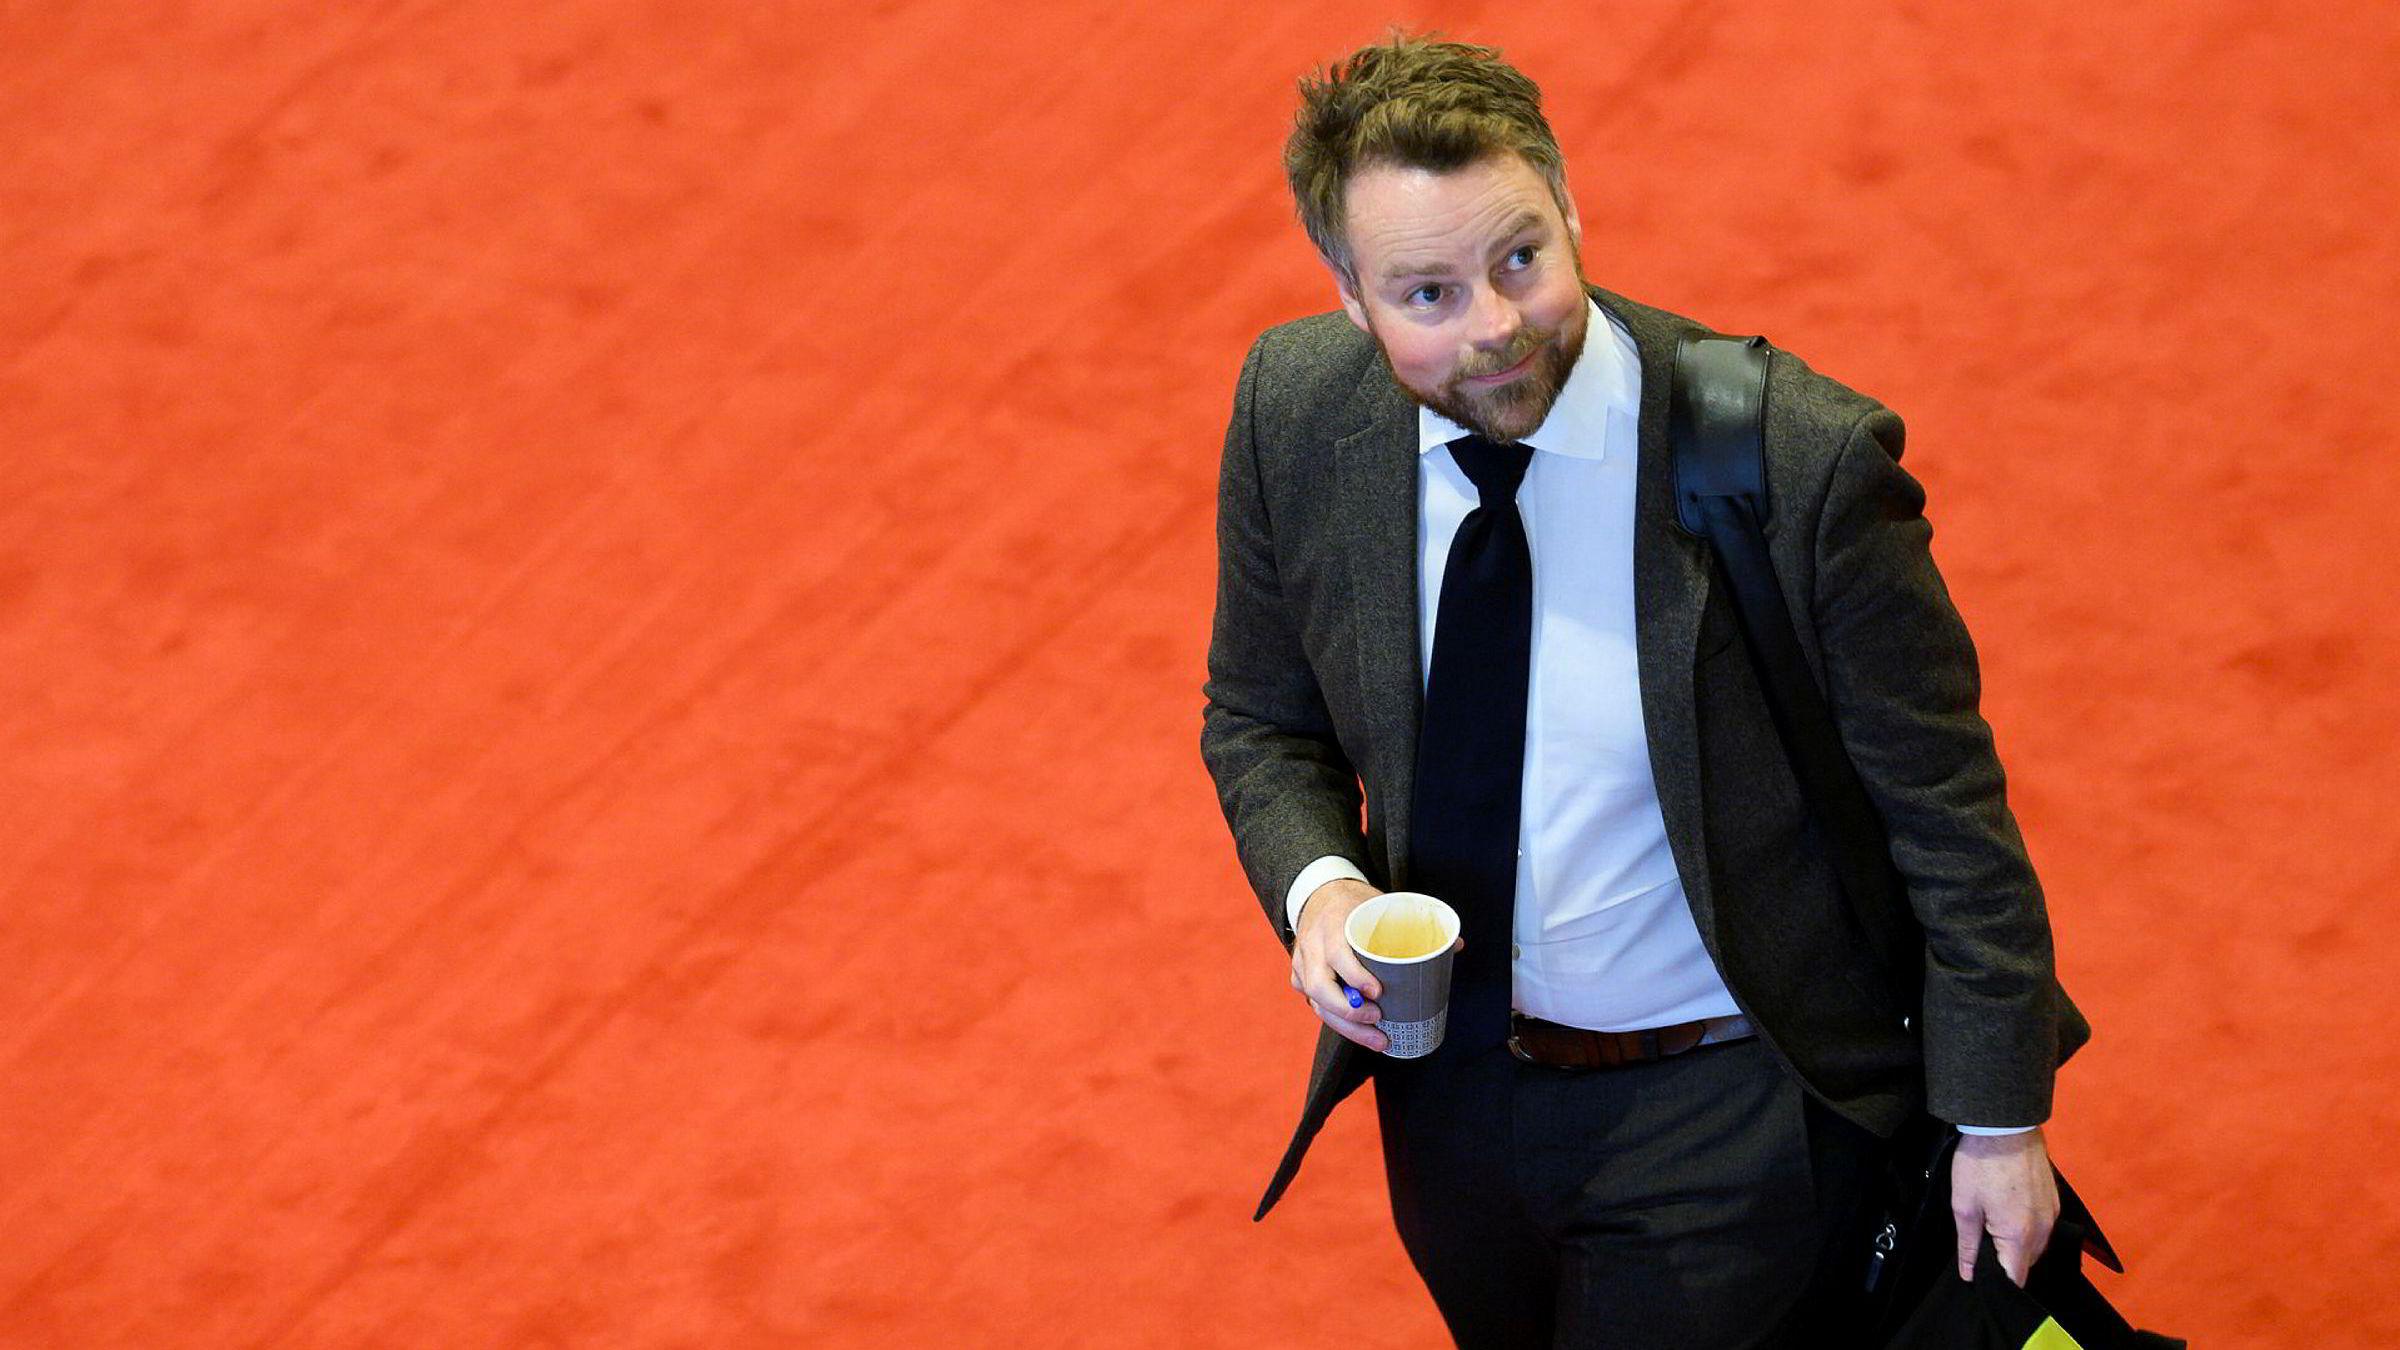 Næringsminister Torbjørn Røe Isaksen delte ut 1,25 milliarder kroner til FoU-støtte til næringslivet før jul.